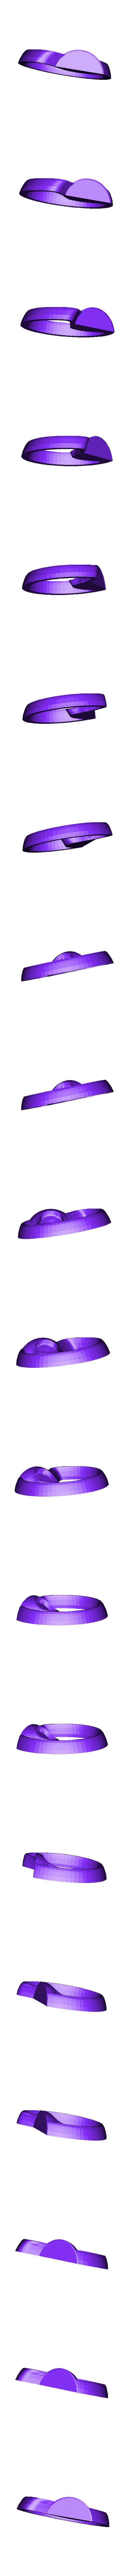 Body_sliced_2.stl Download free STL file Oculus Rift Controller • Model to 3D print, indigo4